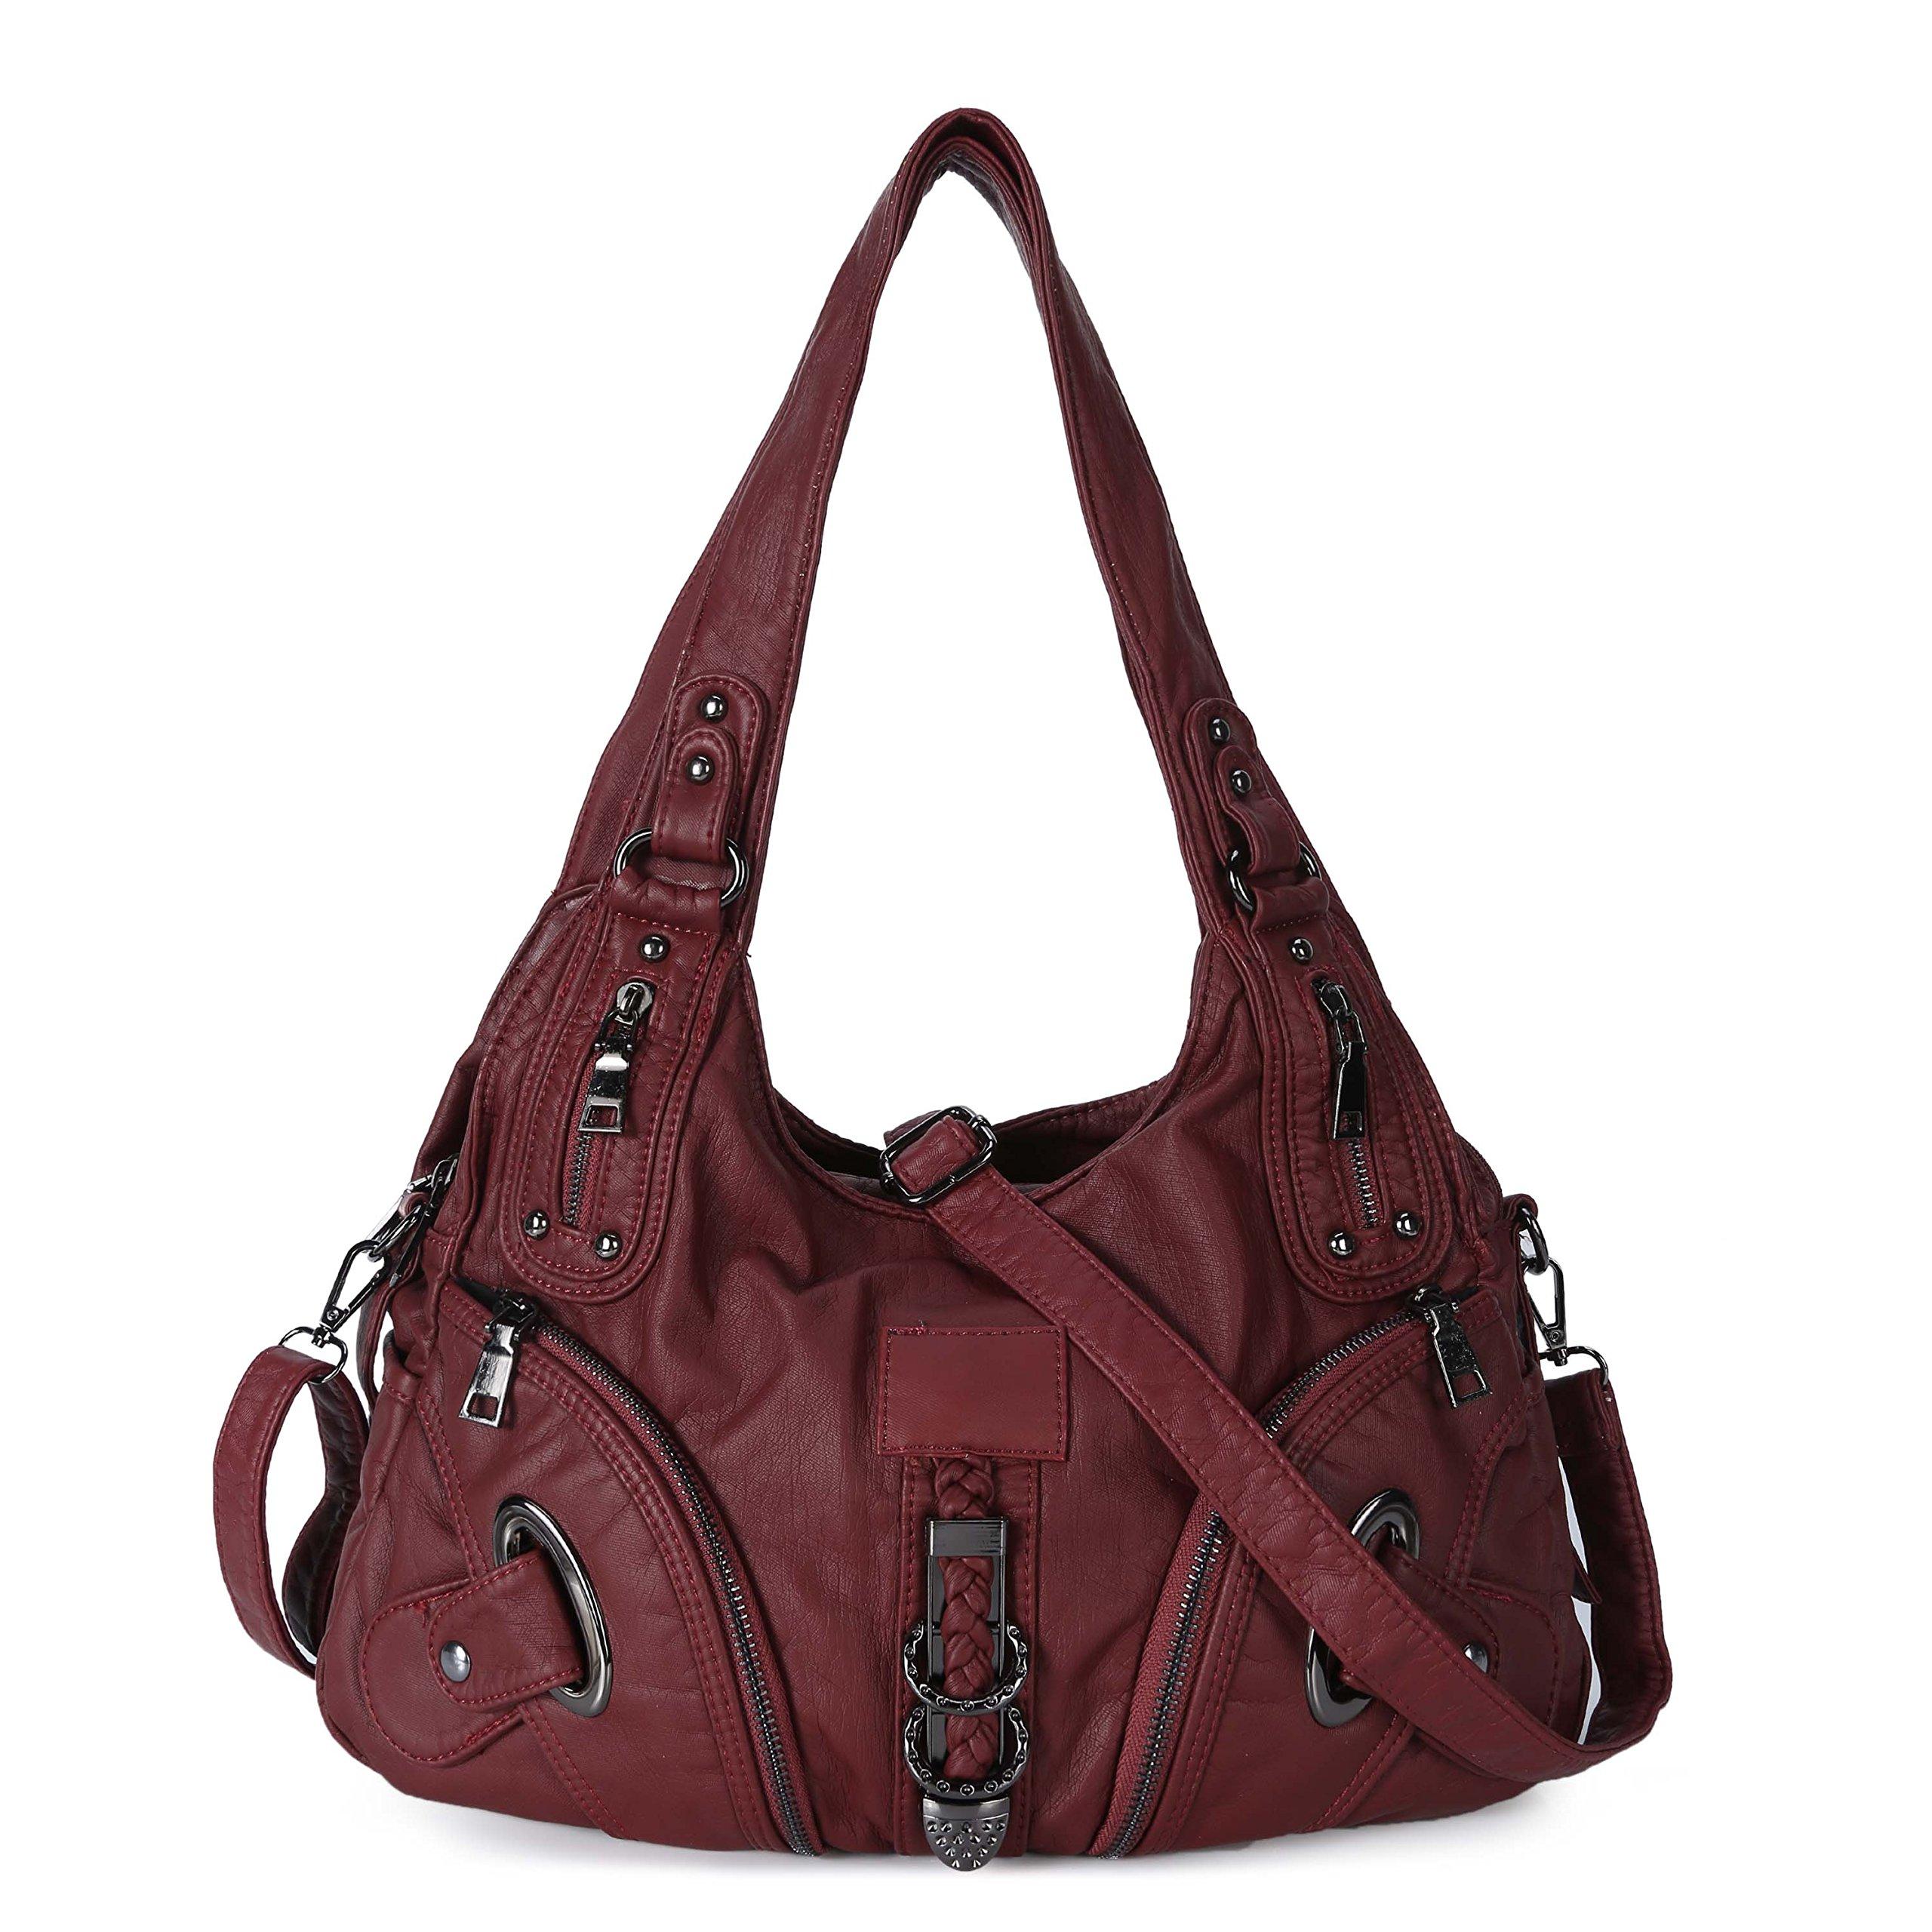 Women Soft Leather Handbag Large Capacity Crossbody Shoulder Bag for Ladies Convertible Hobo Purse Burgandy by Genold